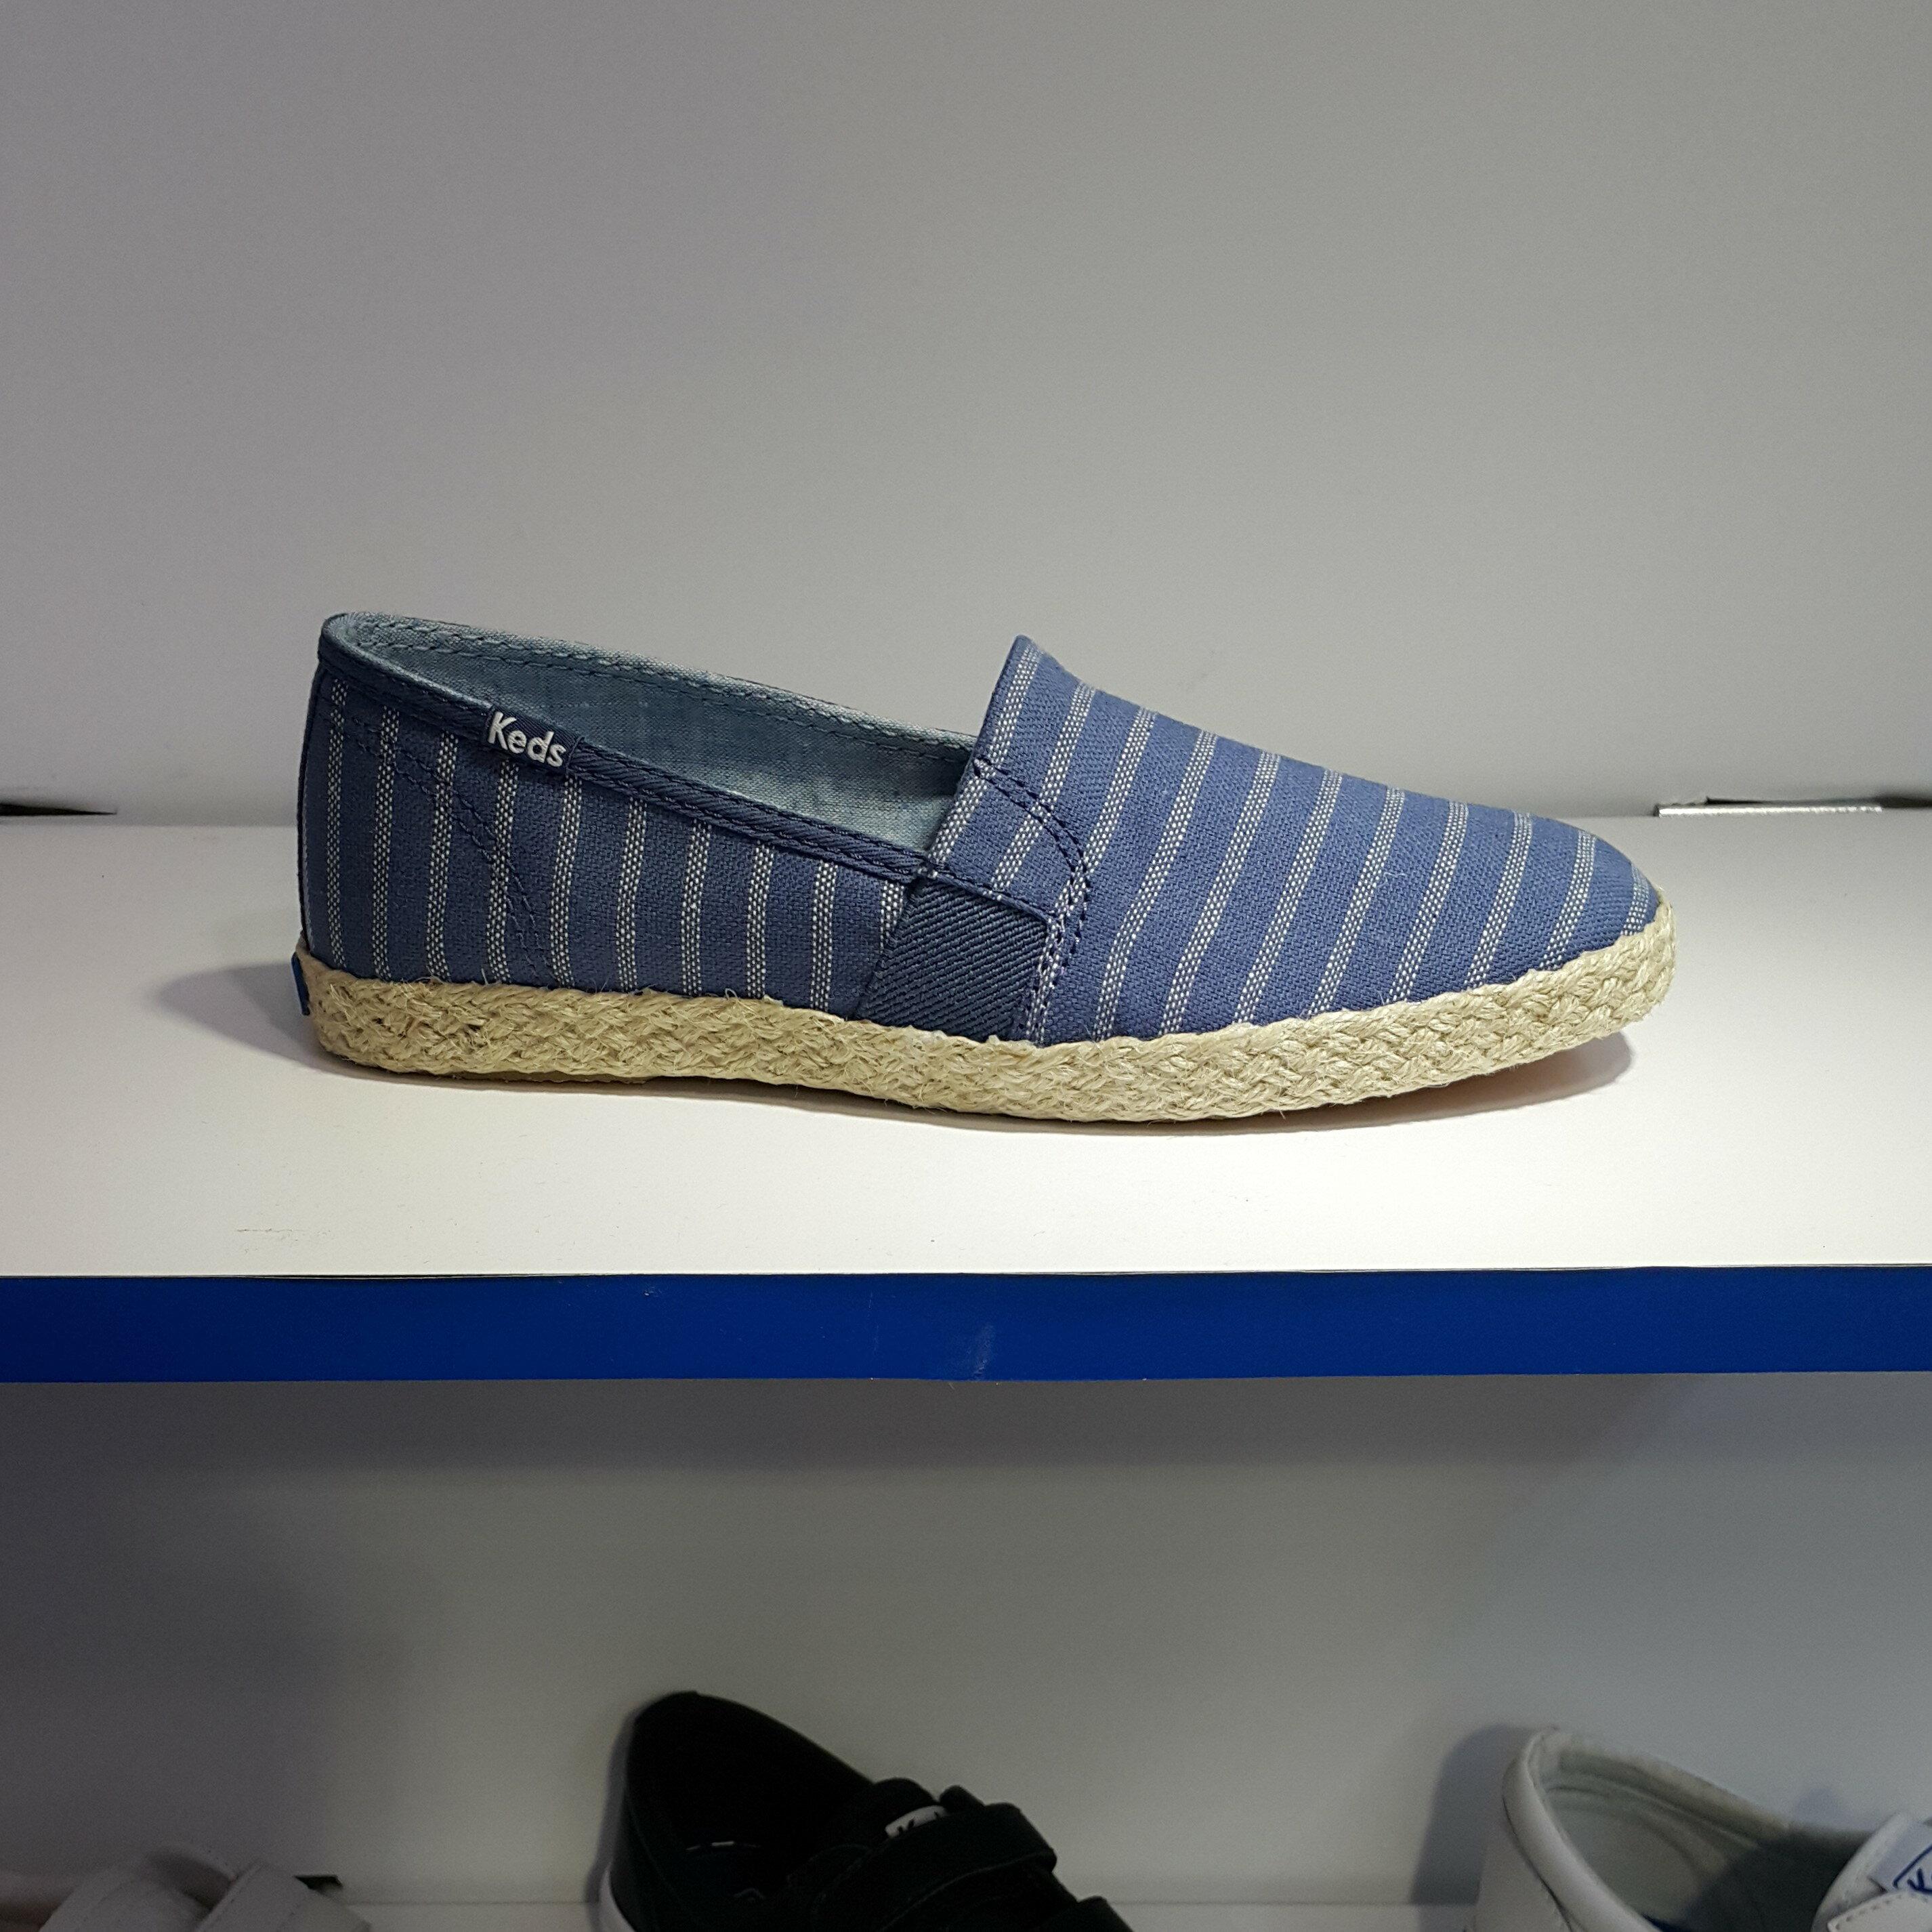 Keds 懶人鞋 麻繩 麻編 草繩 草編 藍色 鬆緊帶 條紋 方便舒適 可拆式鞋墊 CHILLAX A-LINE STRIPE/JUTE